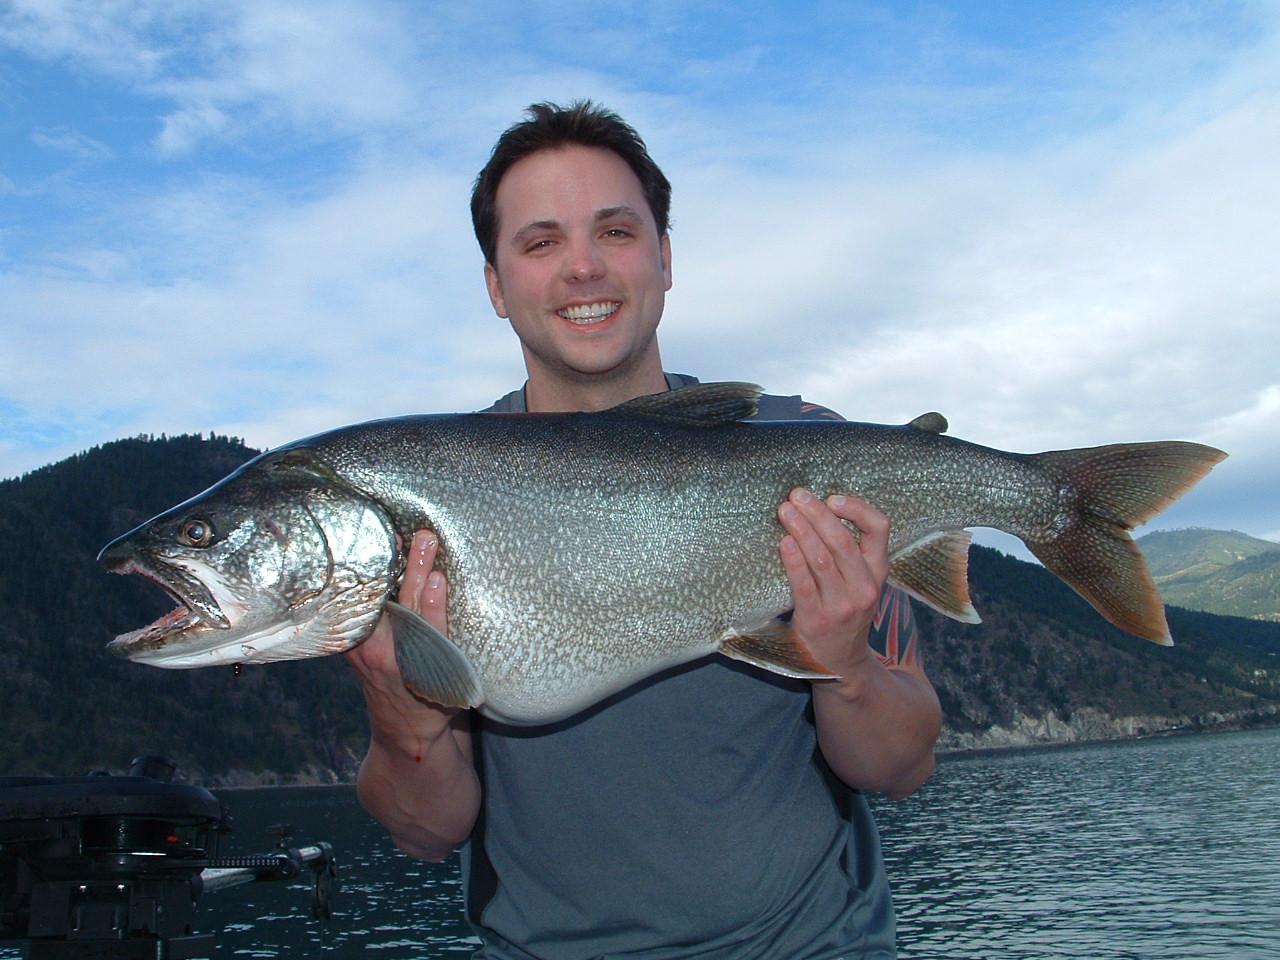 Northwest salmon and steelhead fishing chelan area for Lake chelan fishing